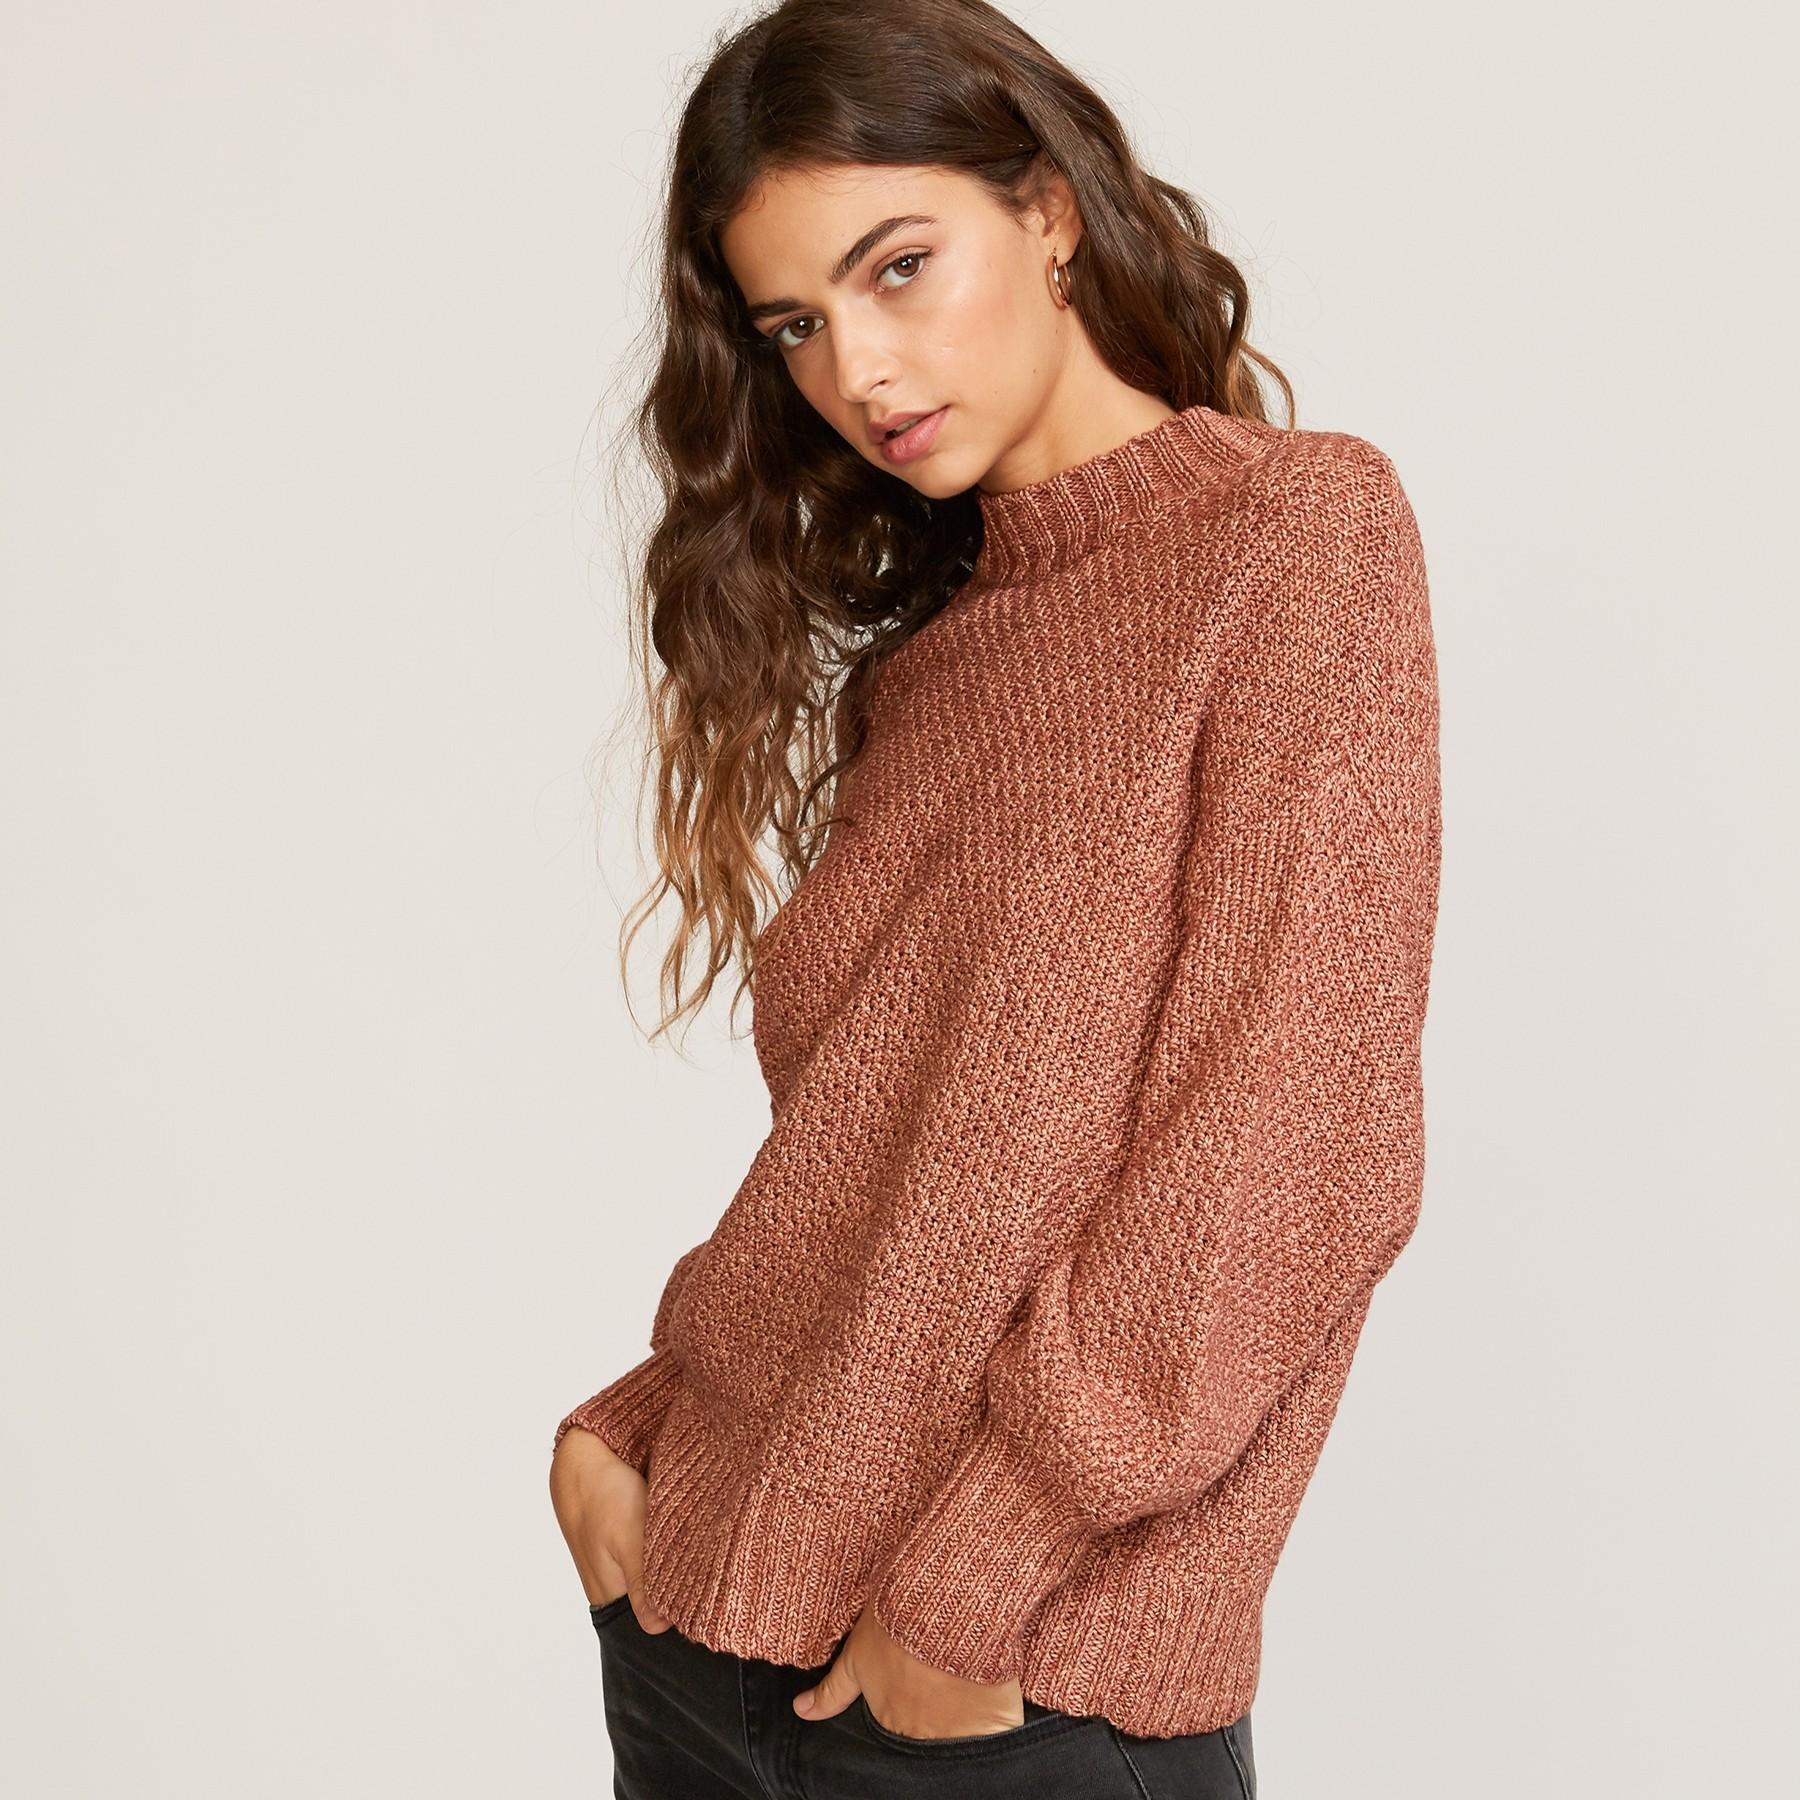 Volt Sweater: Nutmeg